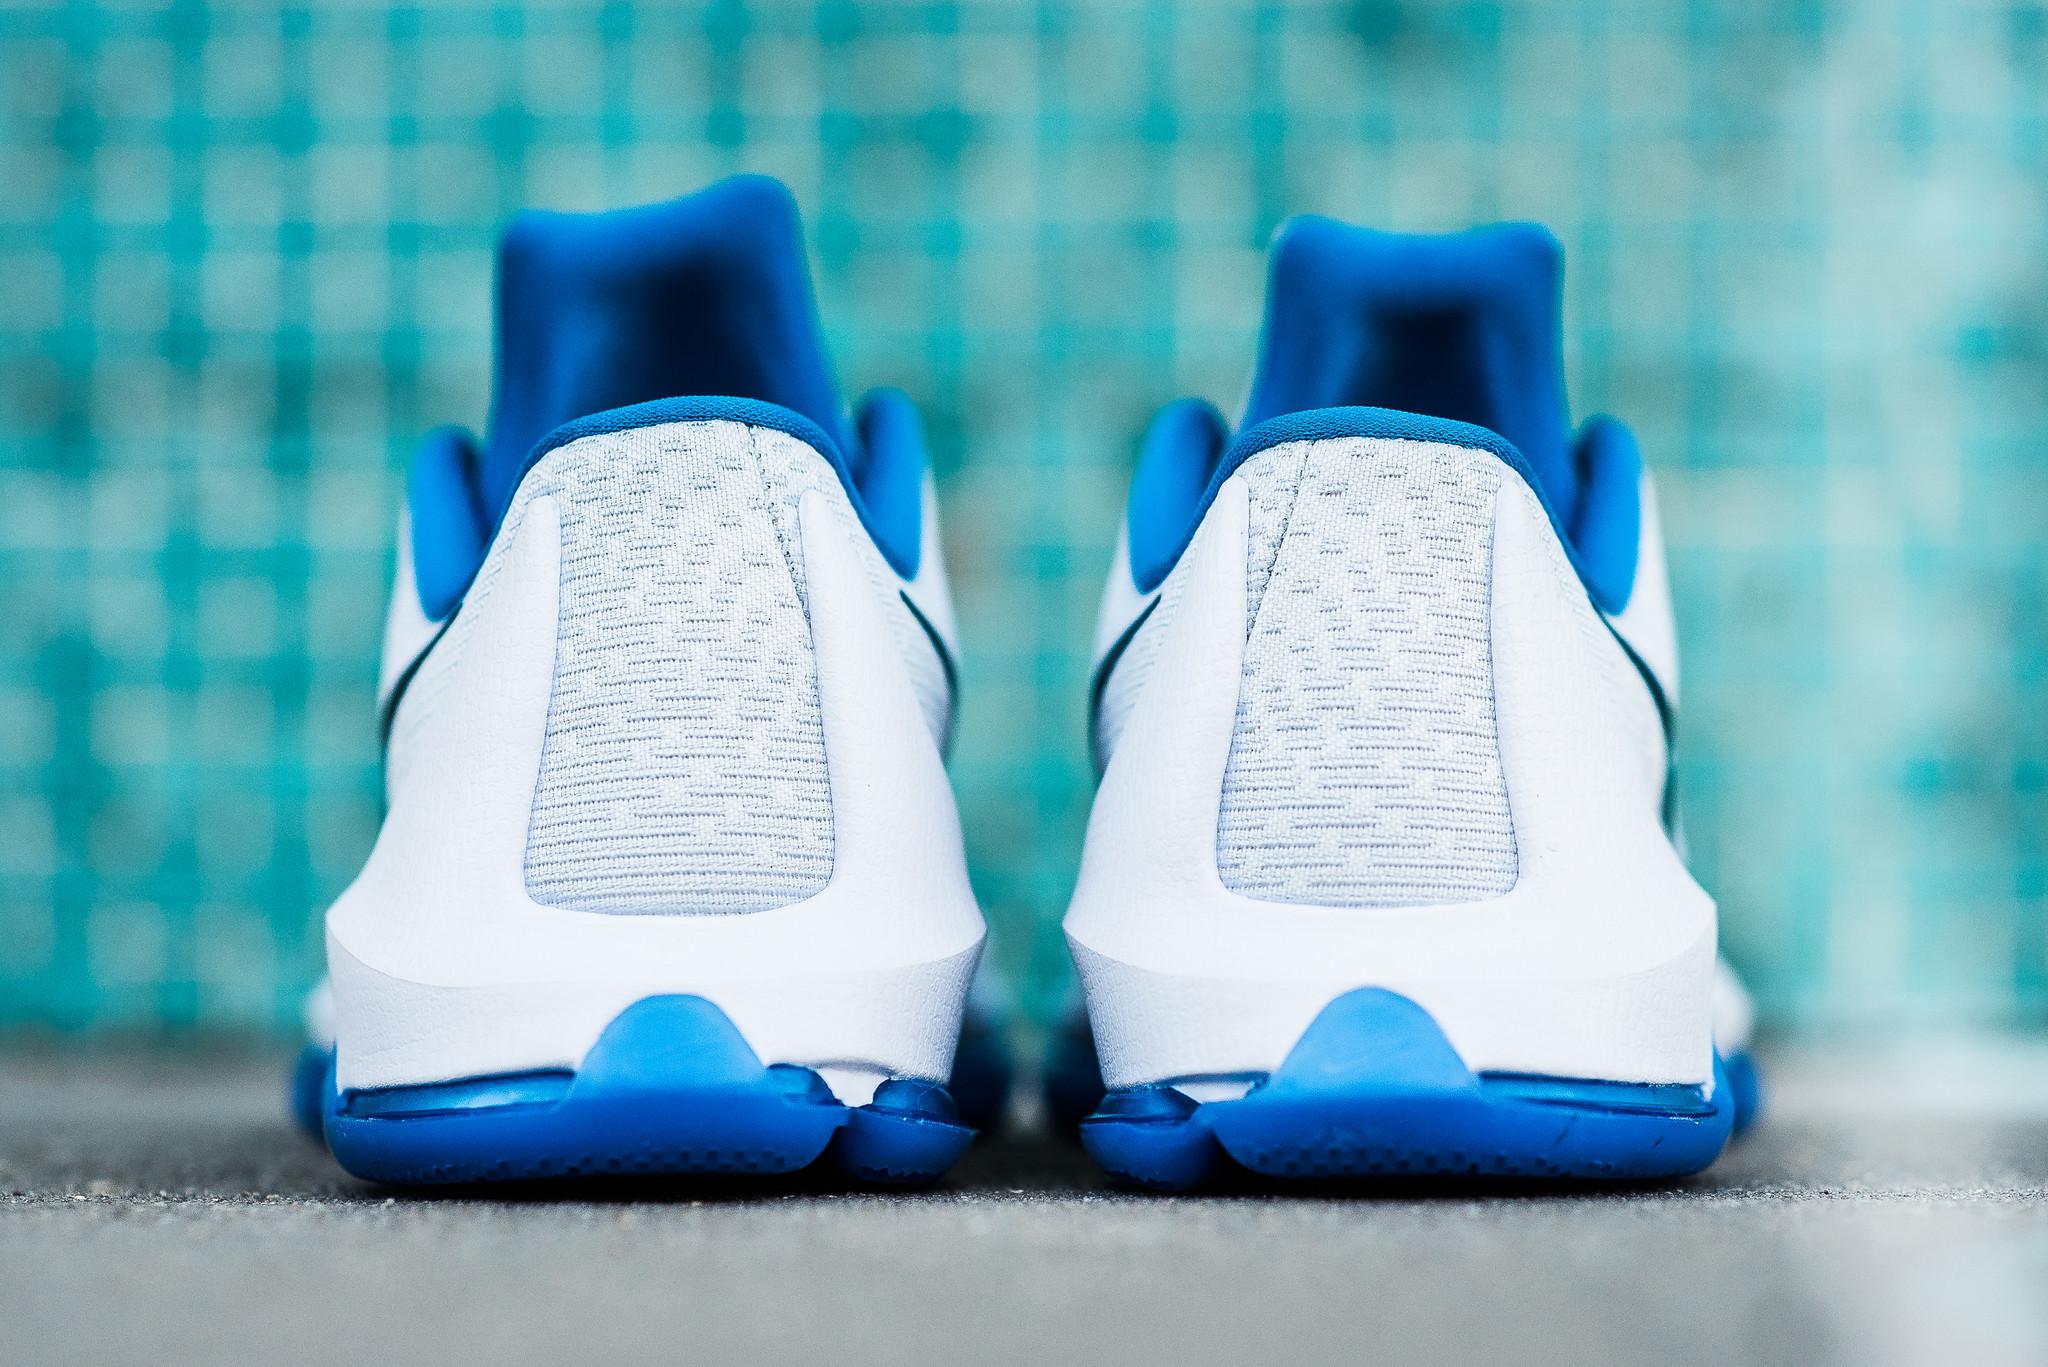 Nike_KD_8_White_Blue_Royal_Sneaker_Politics_Hypebeast_5_8119dcde-9936-48e2-9eb5-b57276638fcc